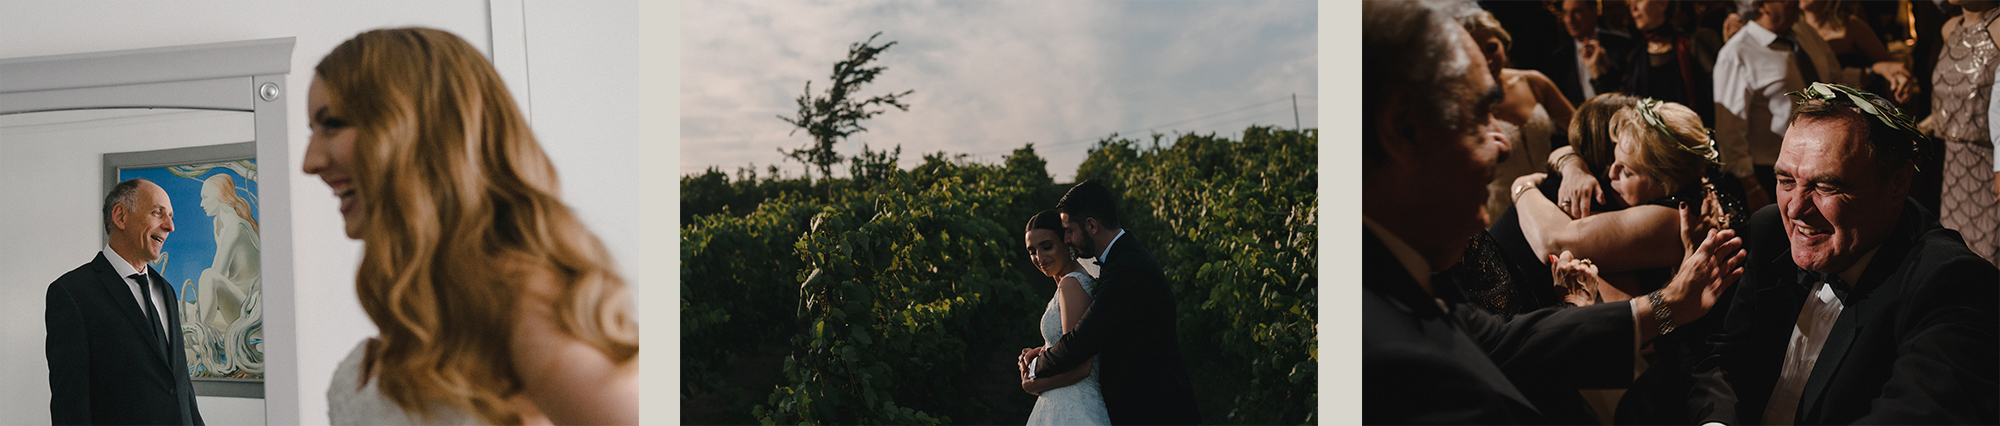 auguste_mariage_wedding_montreal_07.JPG